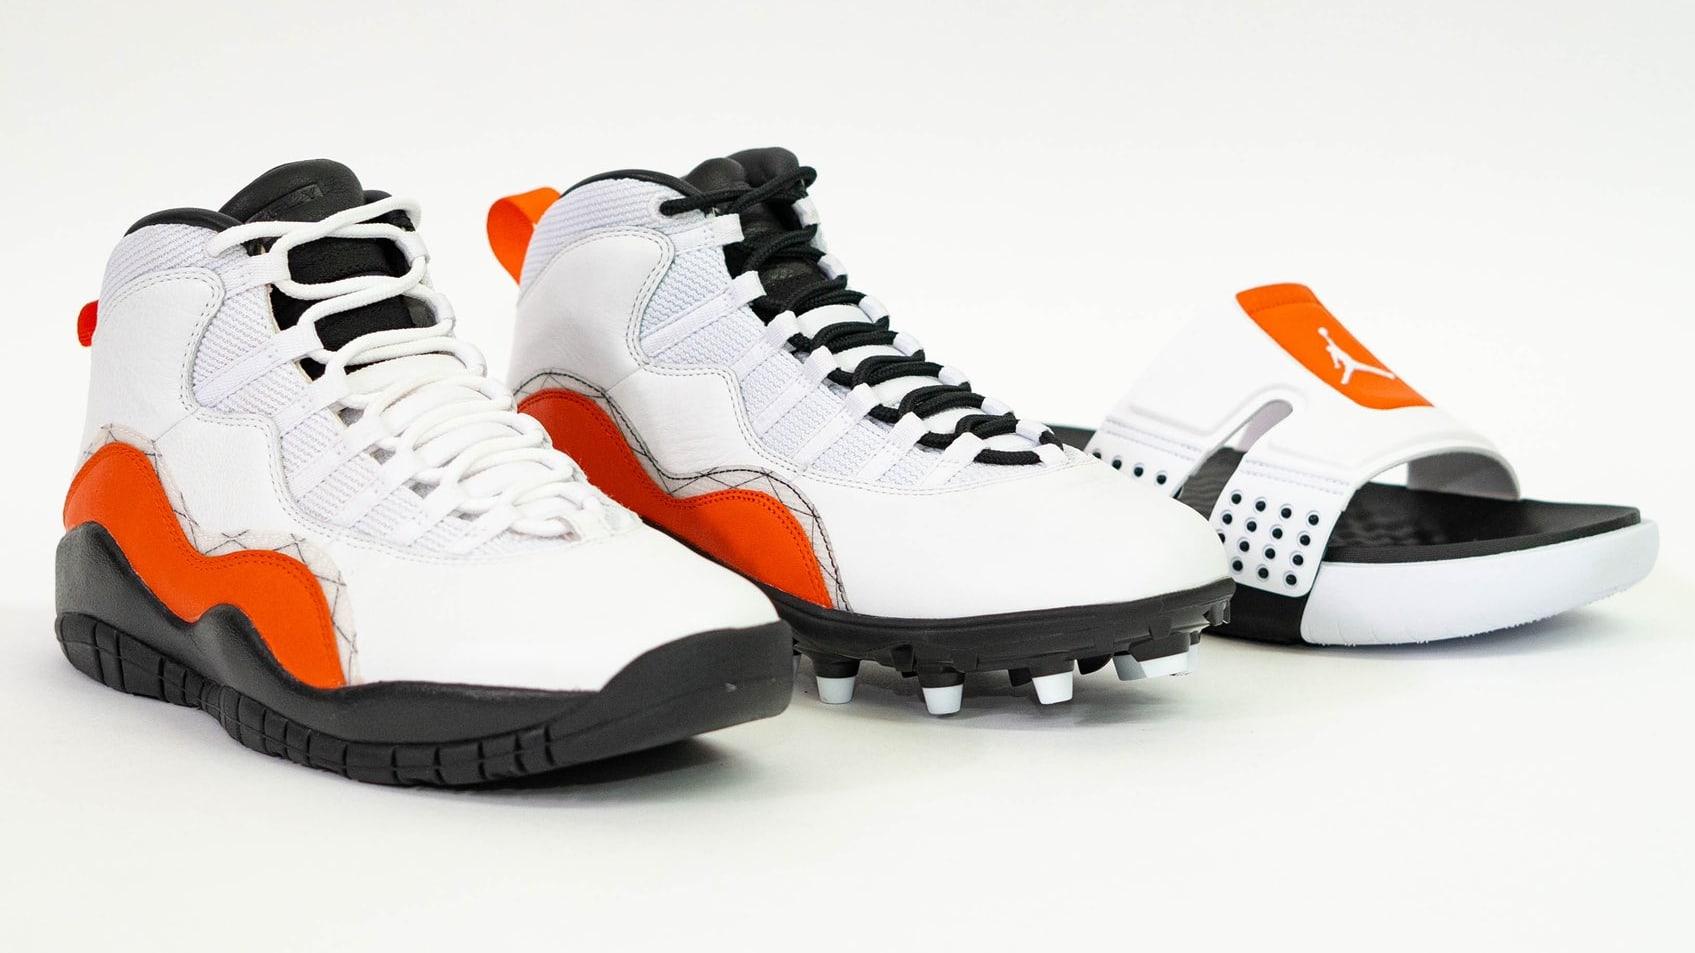 SoleFly x Air Jordan Super Bowl Footwear